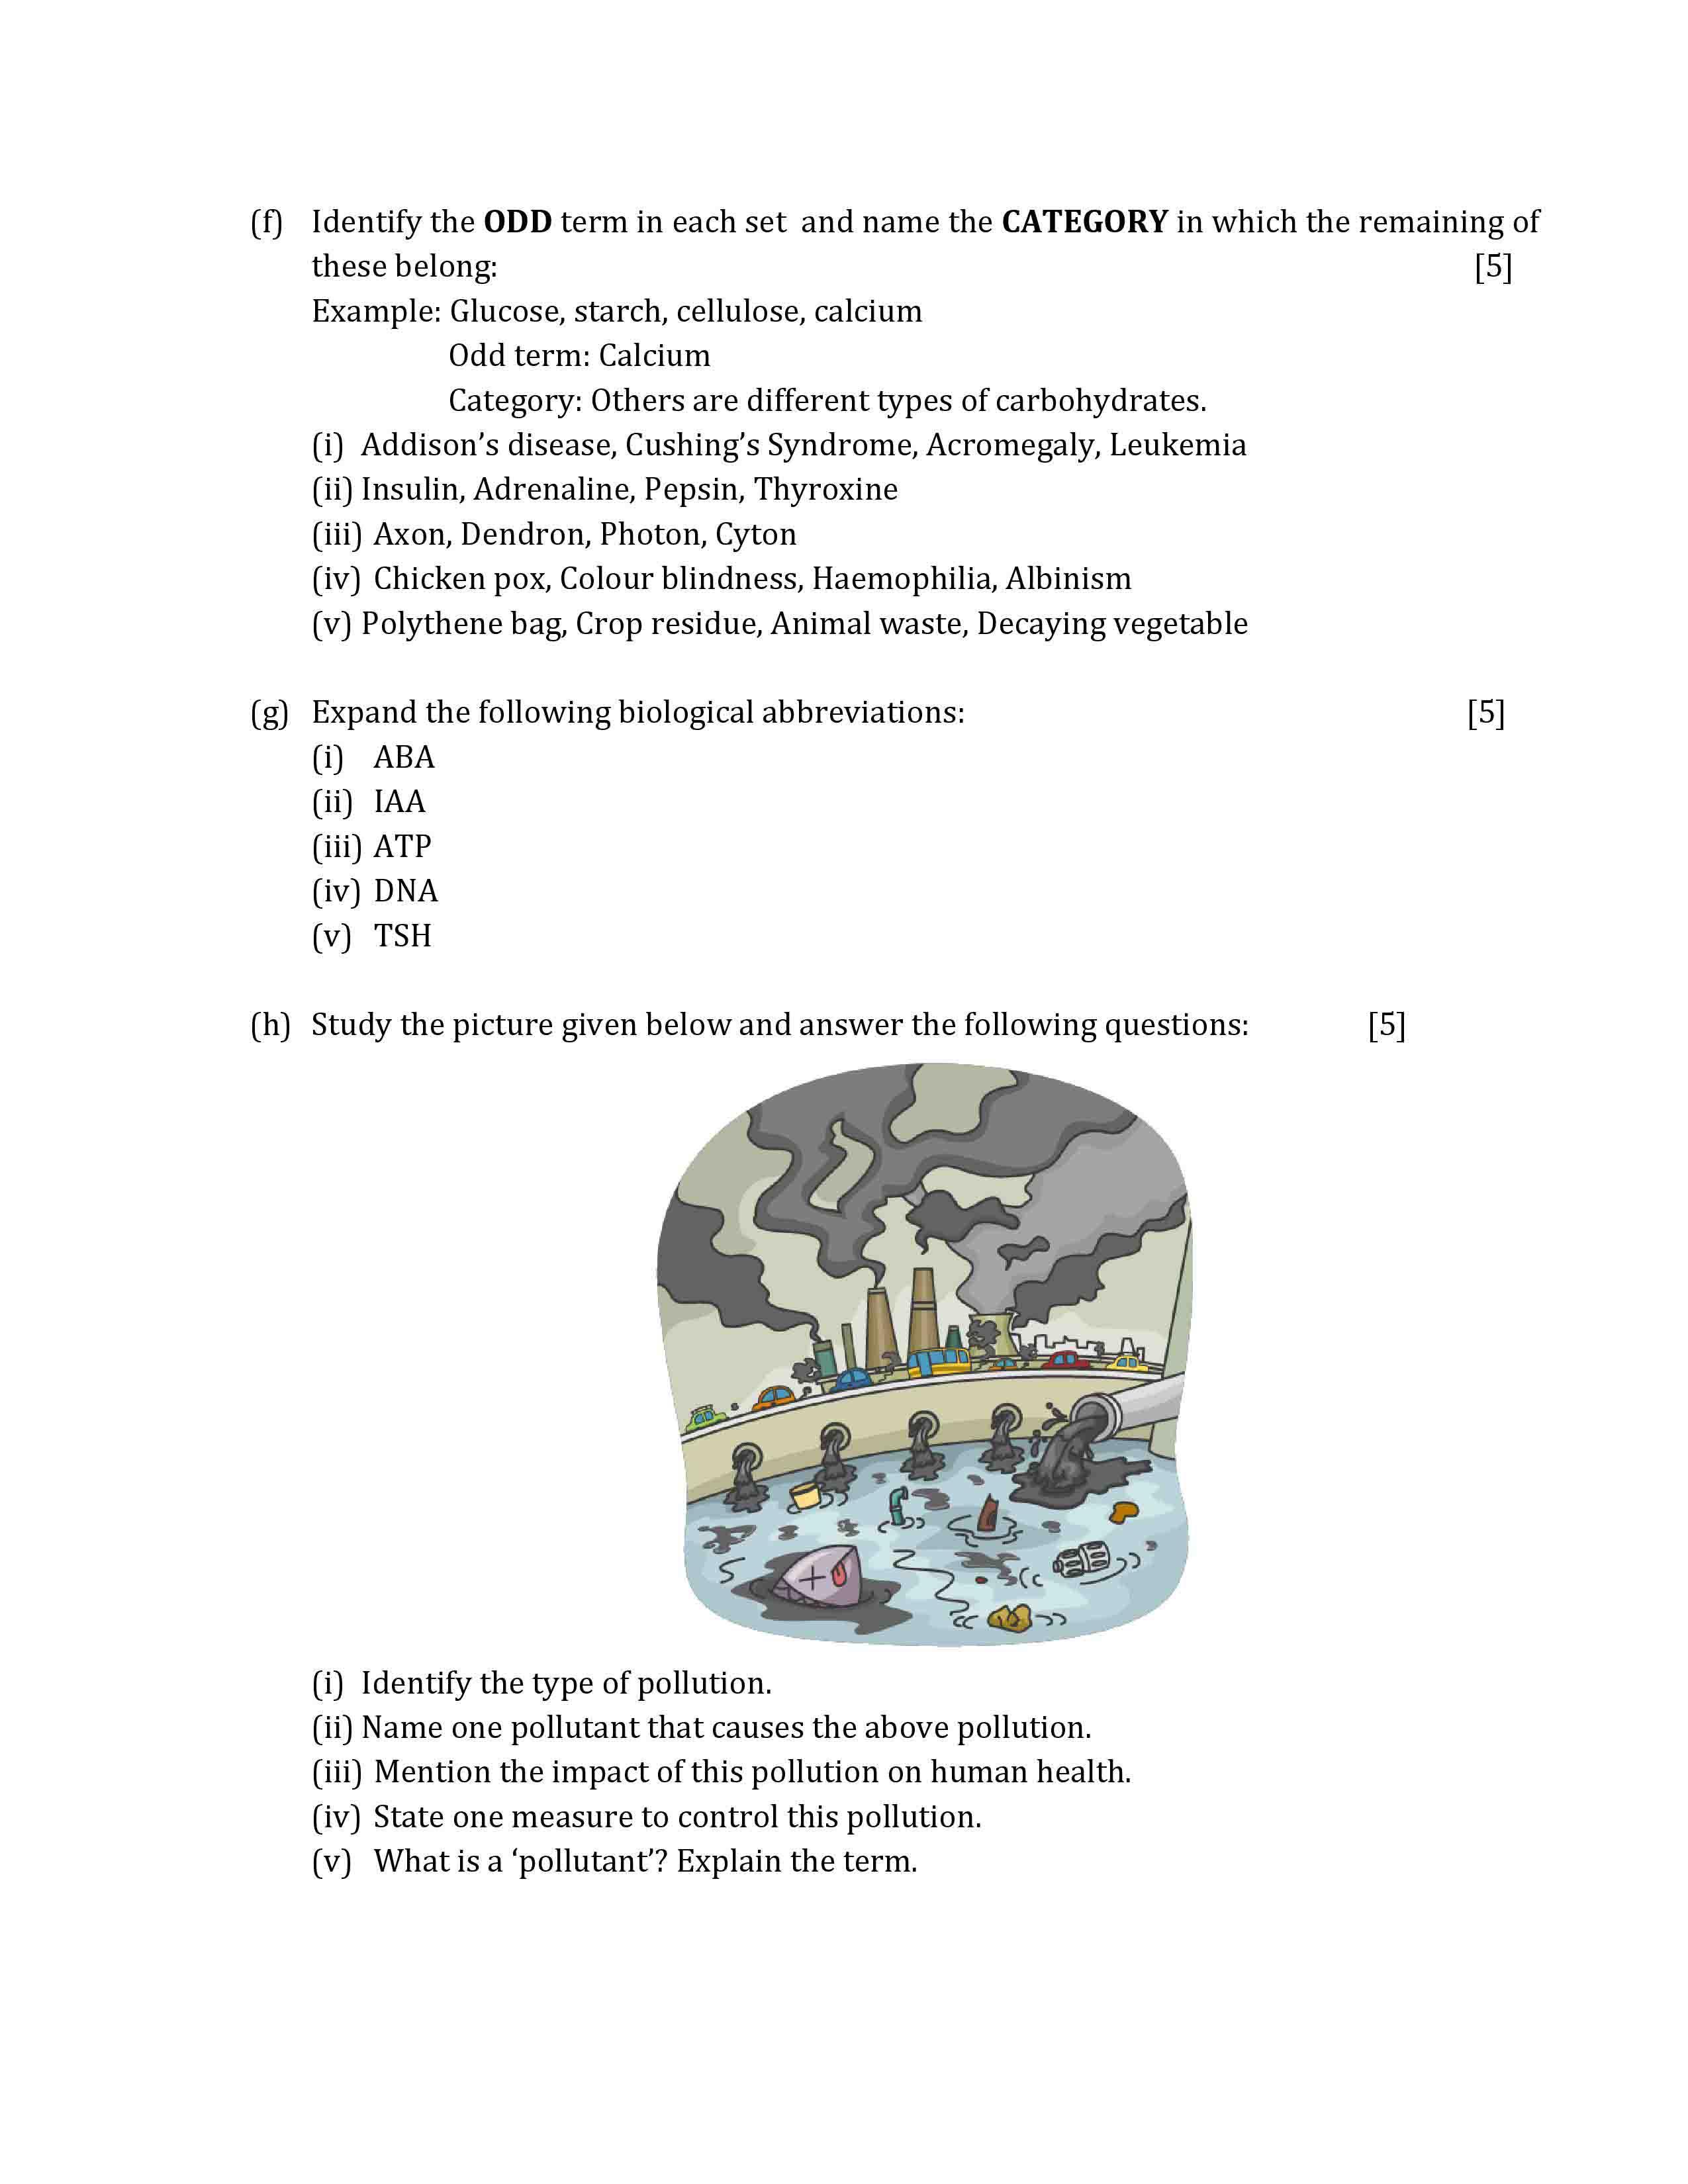 ICSE Class 10 Biology 2019 Question Paper